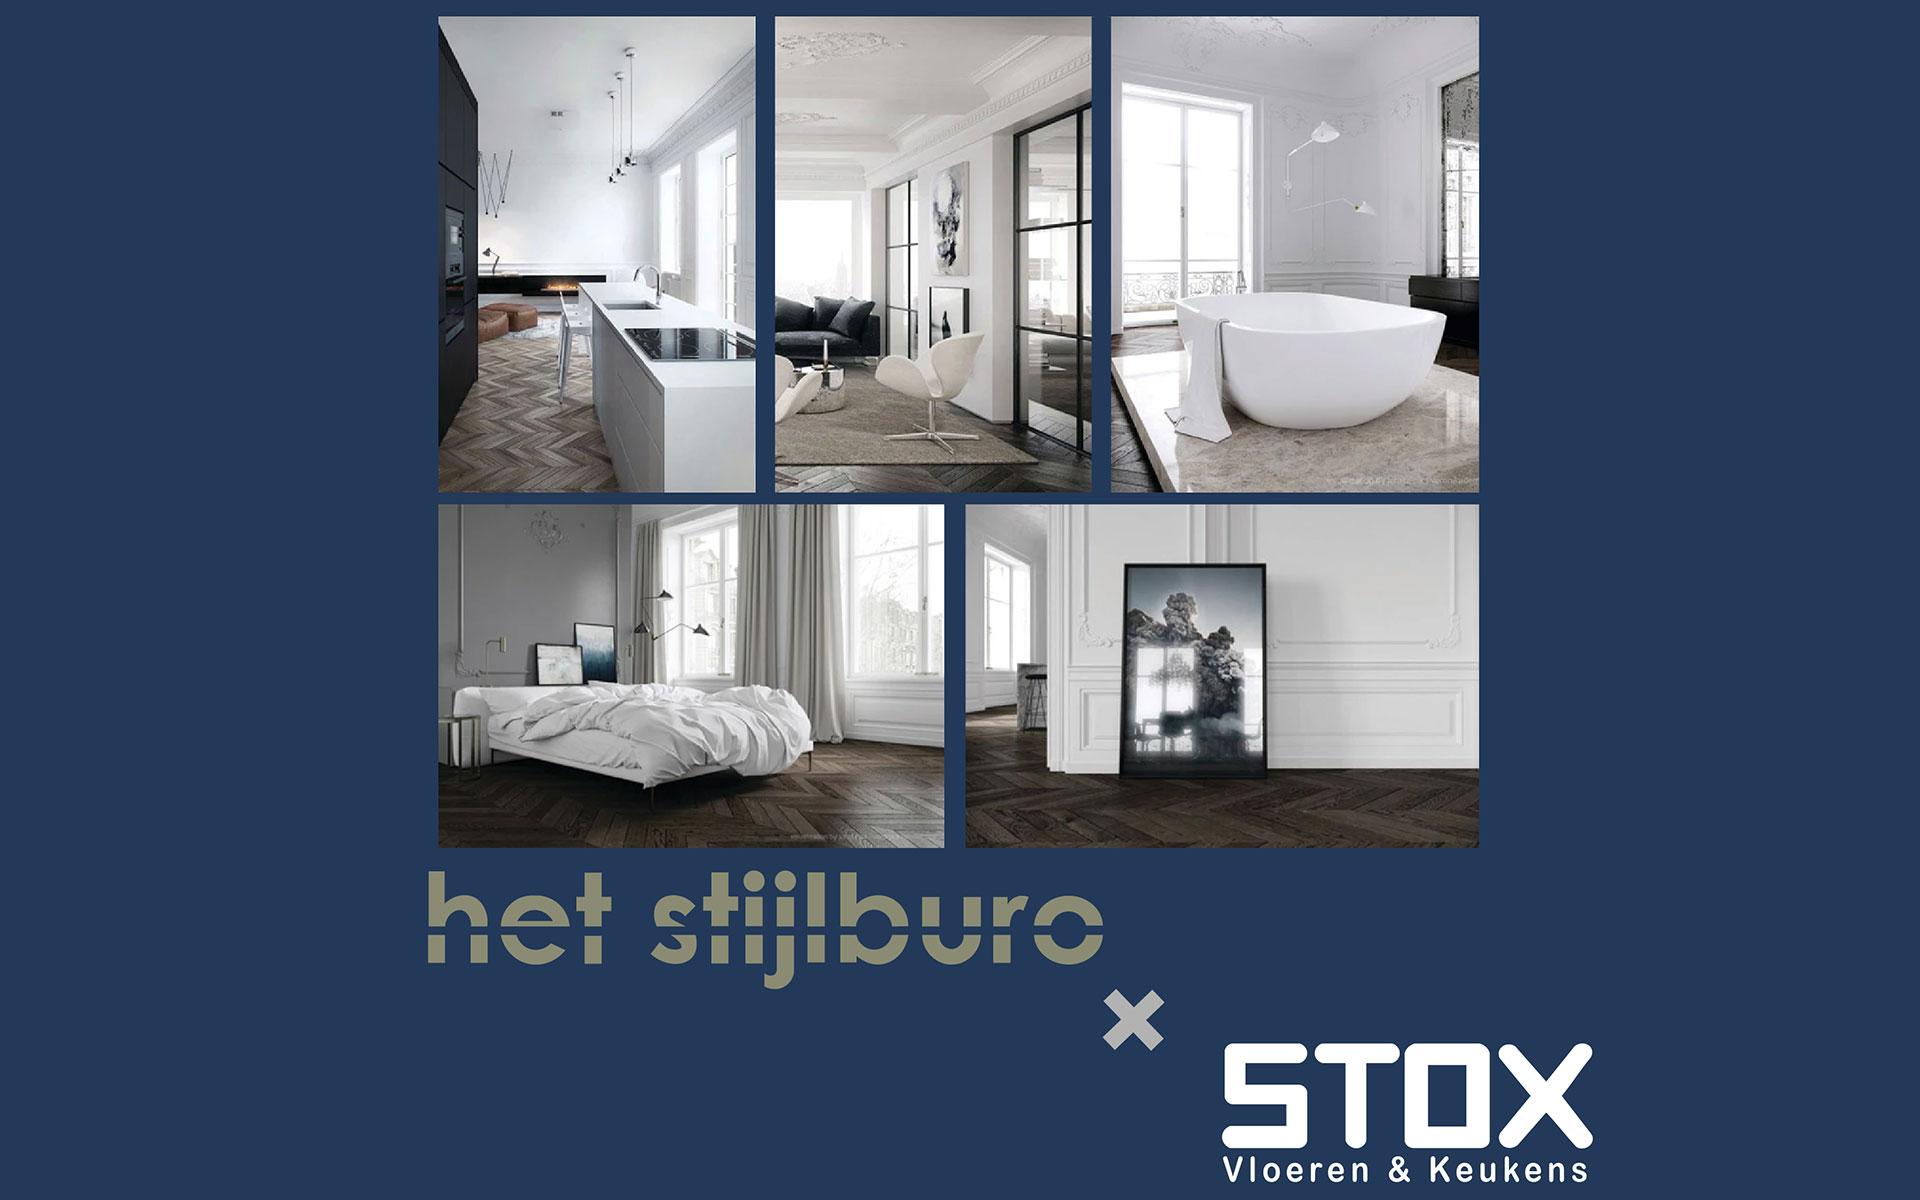 STOX-design-event-7 December